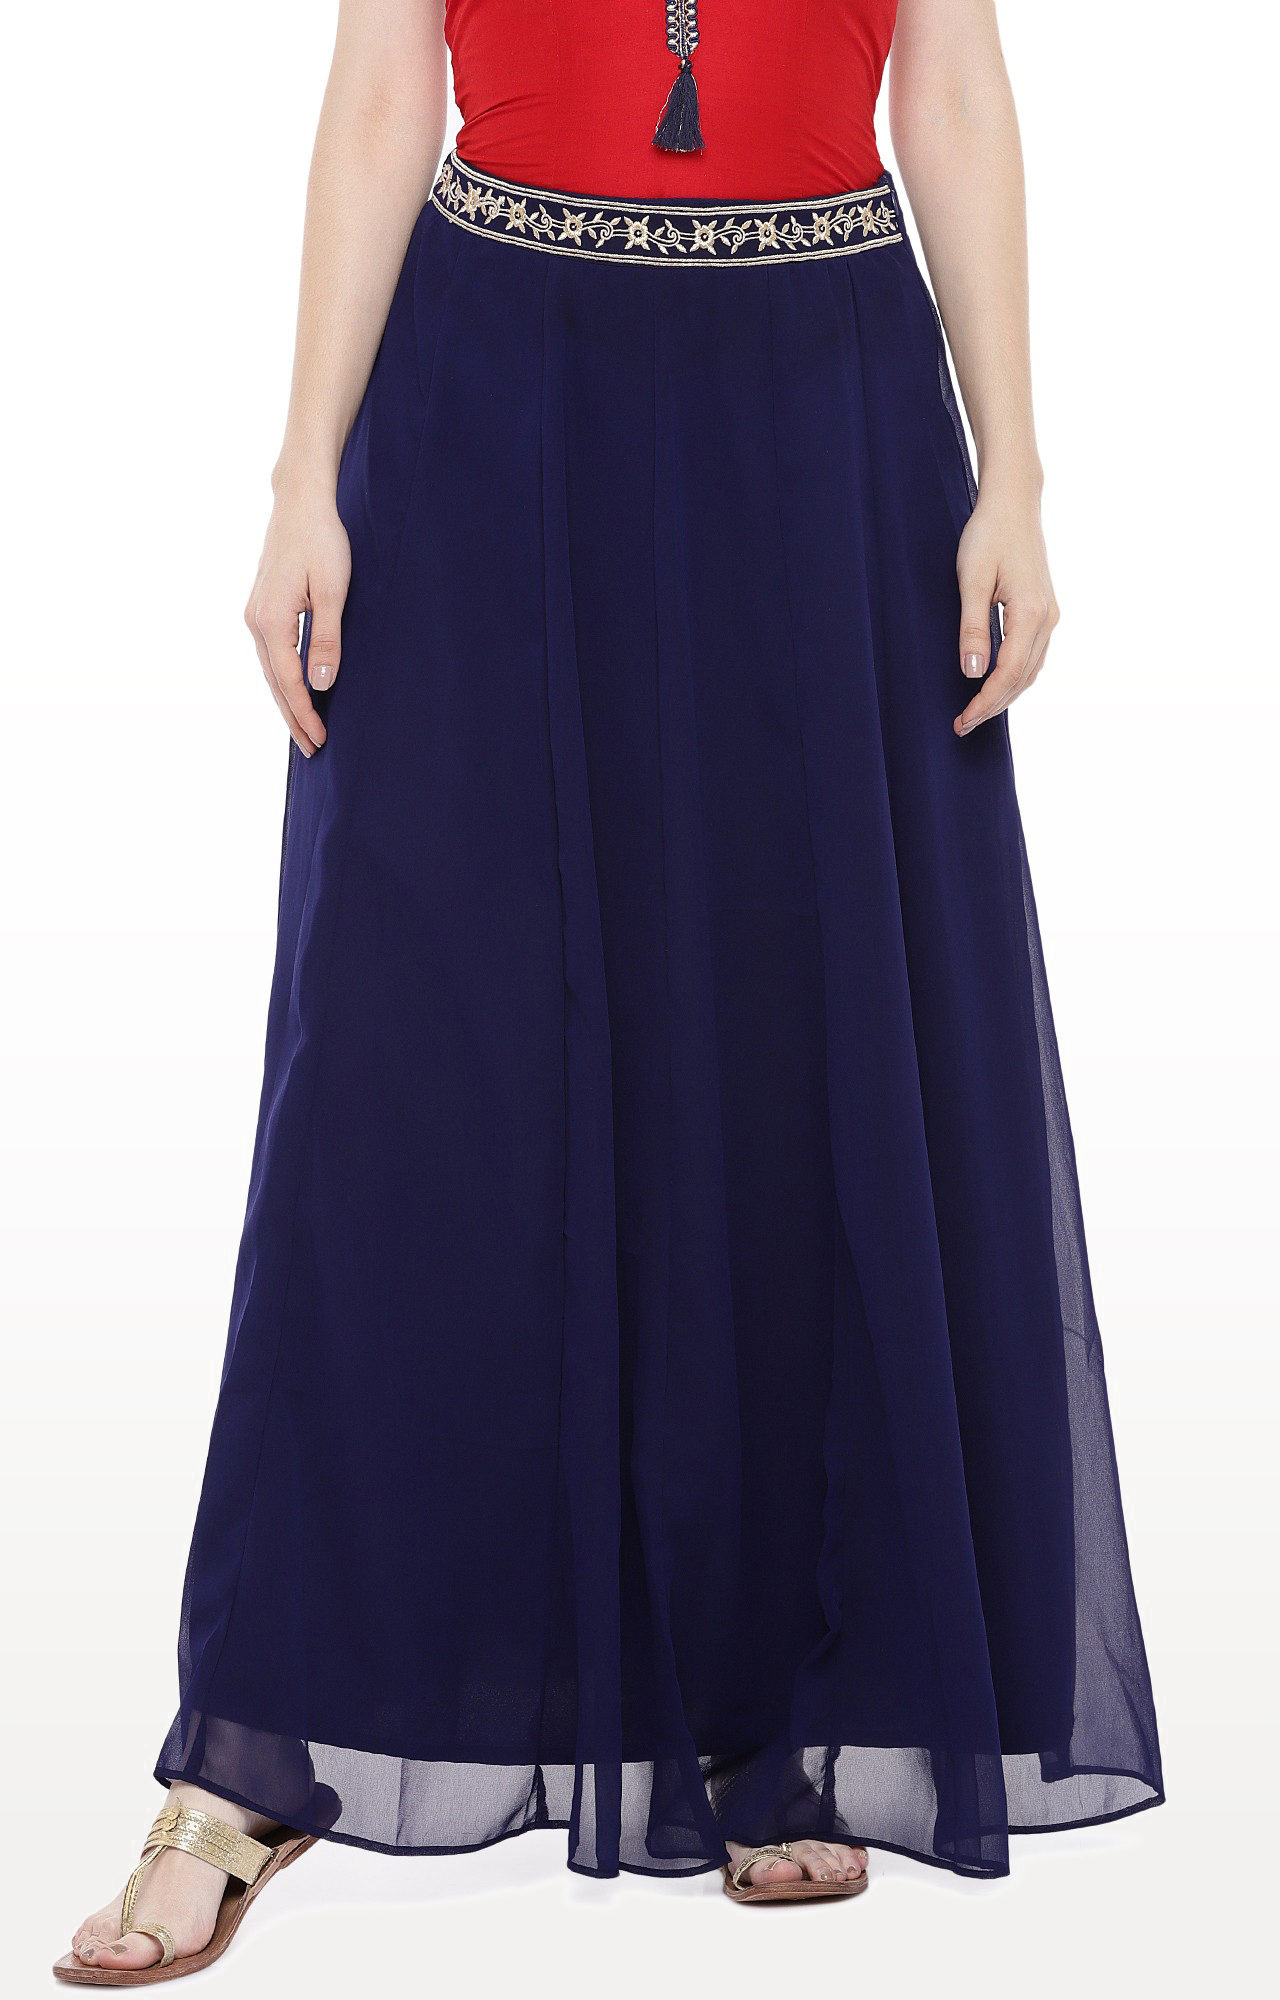 globus | Blue Solid Flared Skirt